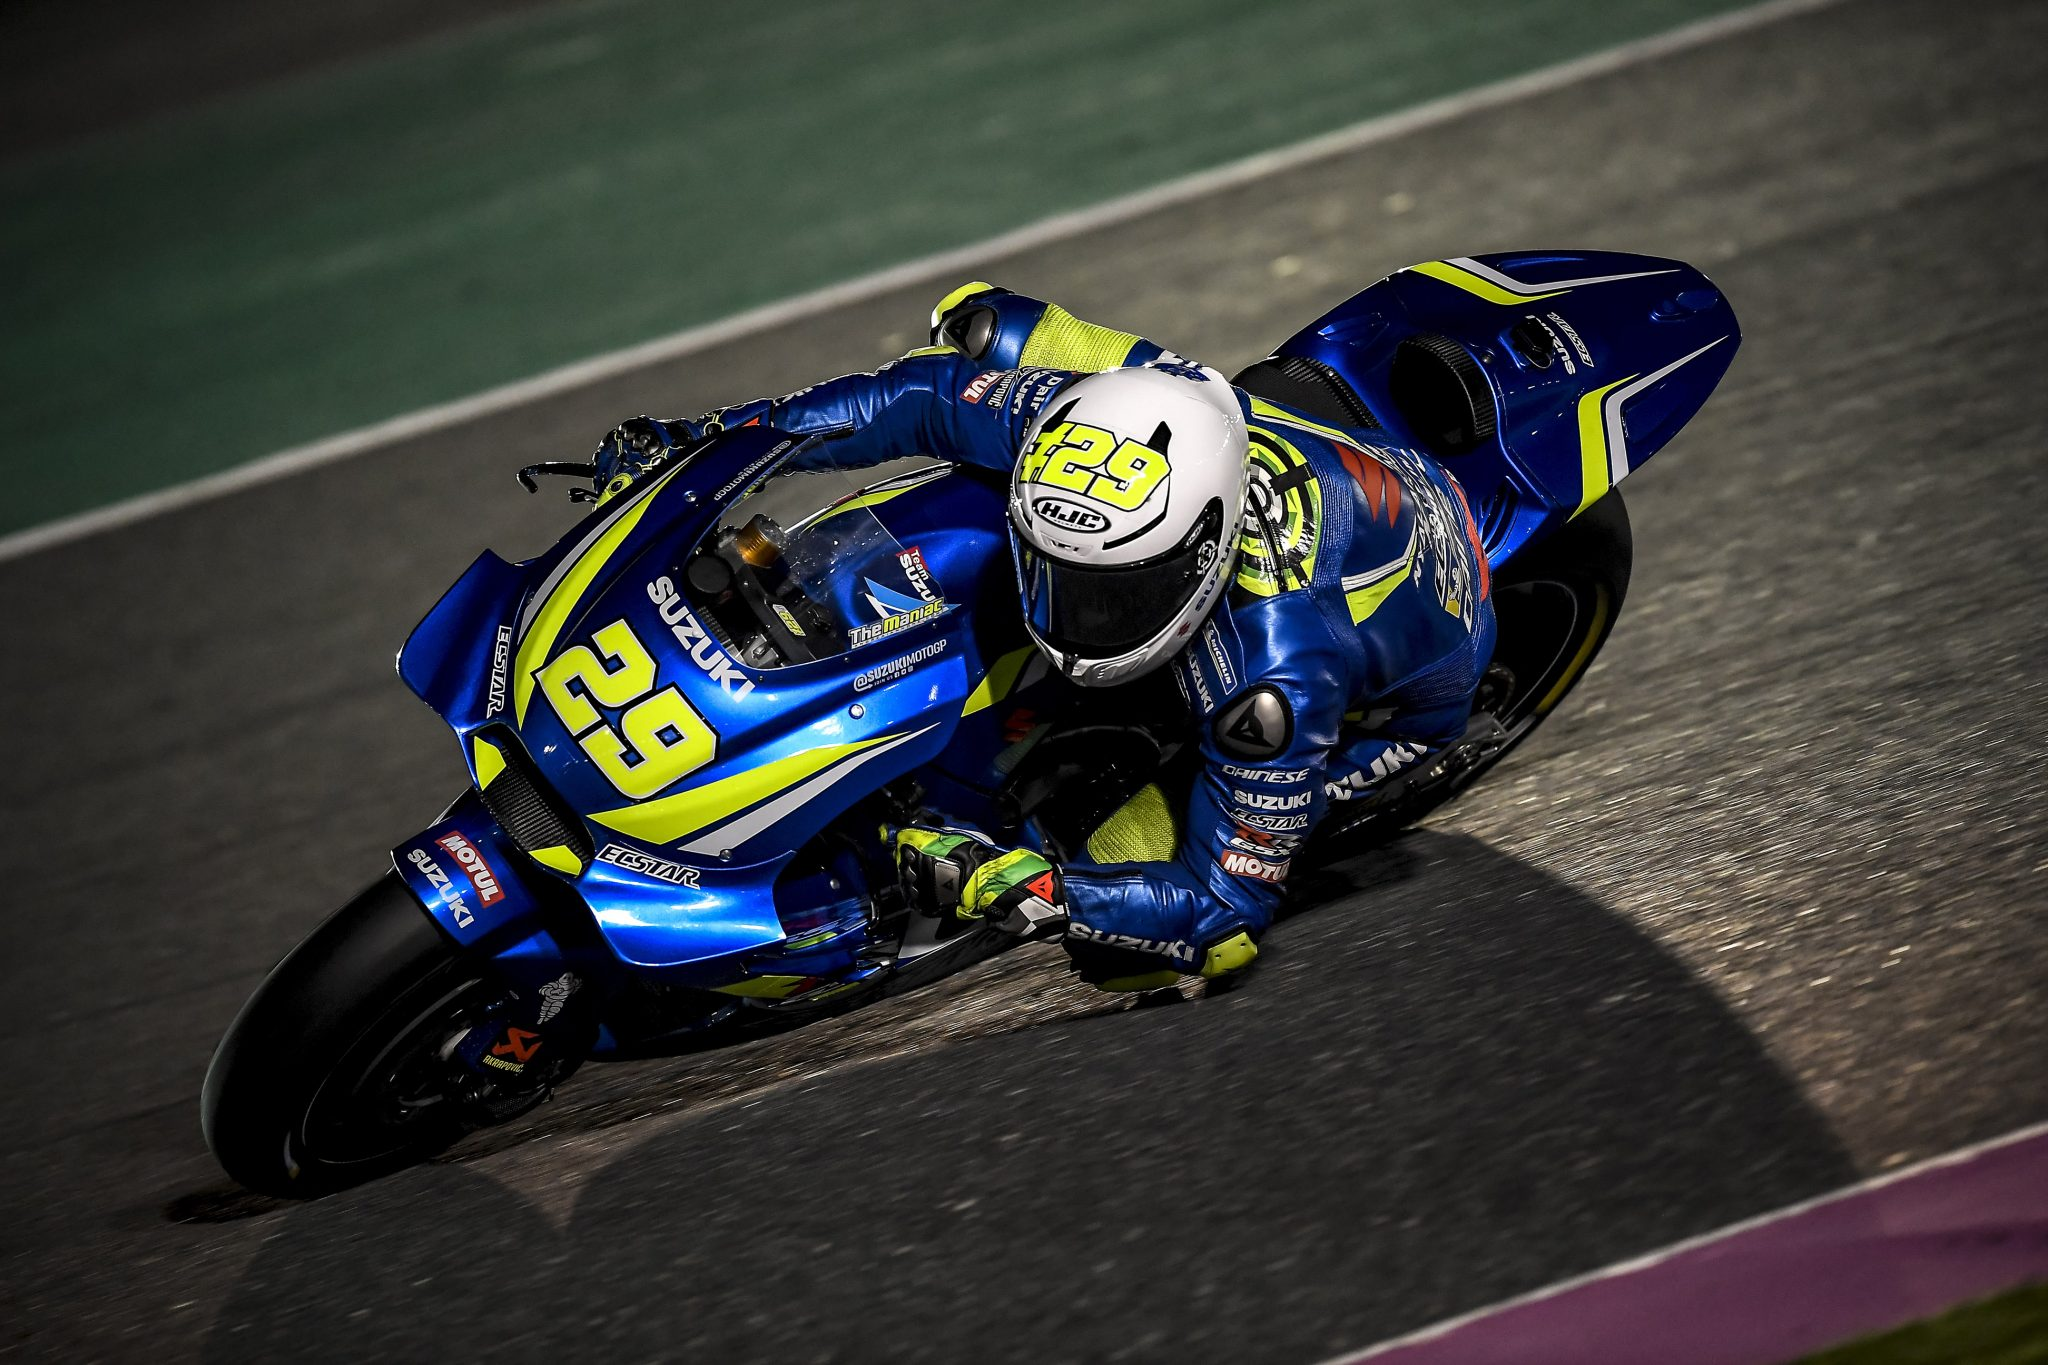 MotoGP – Andrea Iannone confirms Suzuki exit